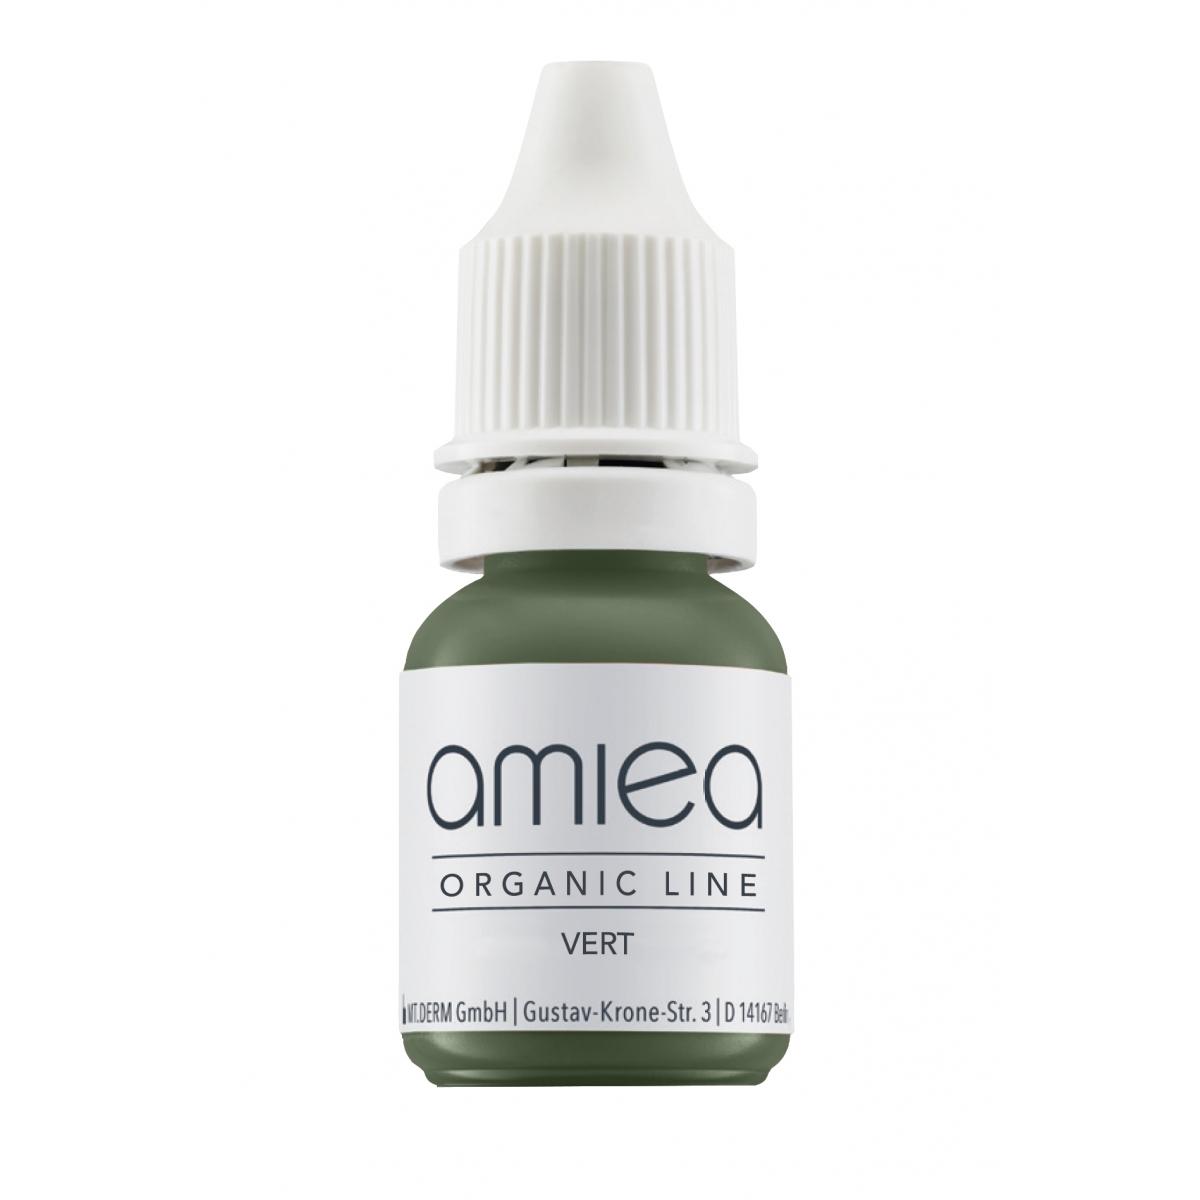 ORGANIC LINE (5ml)  - PIGMENT CORRECTEUR VERT ORGANICLINE AMIEA (5 ml)